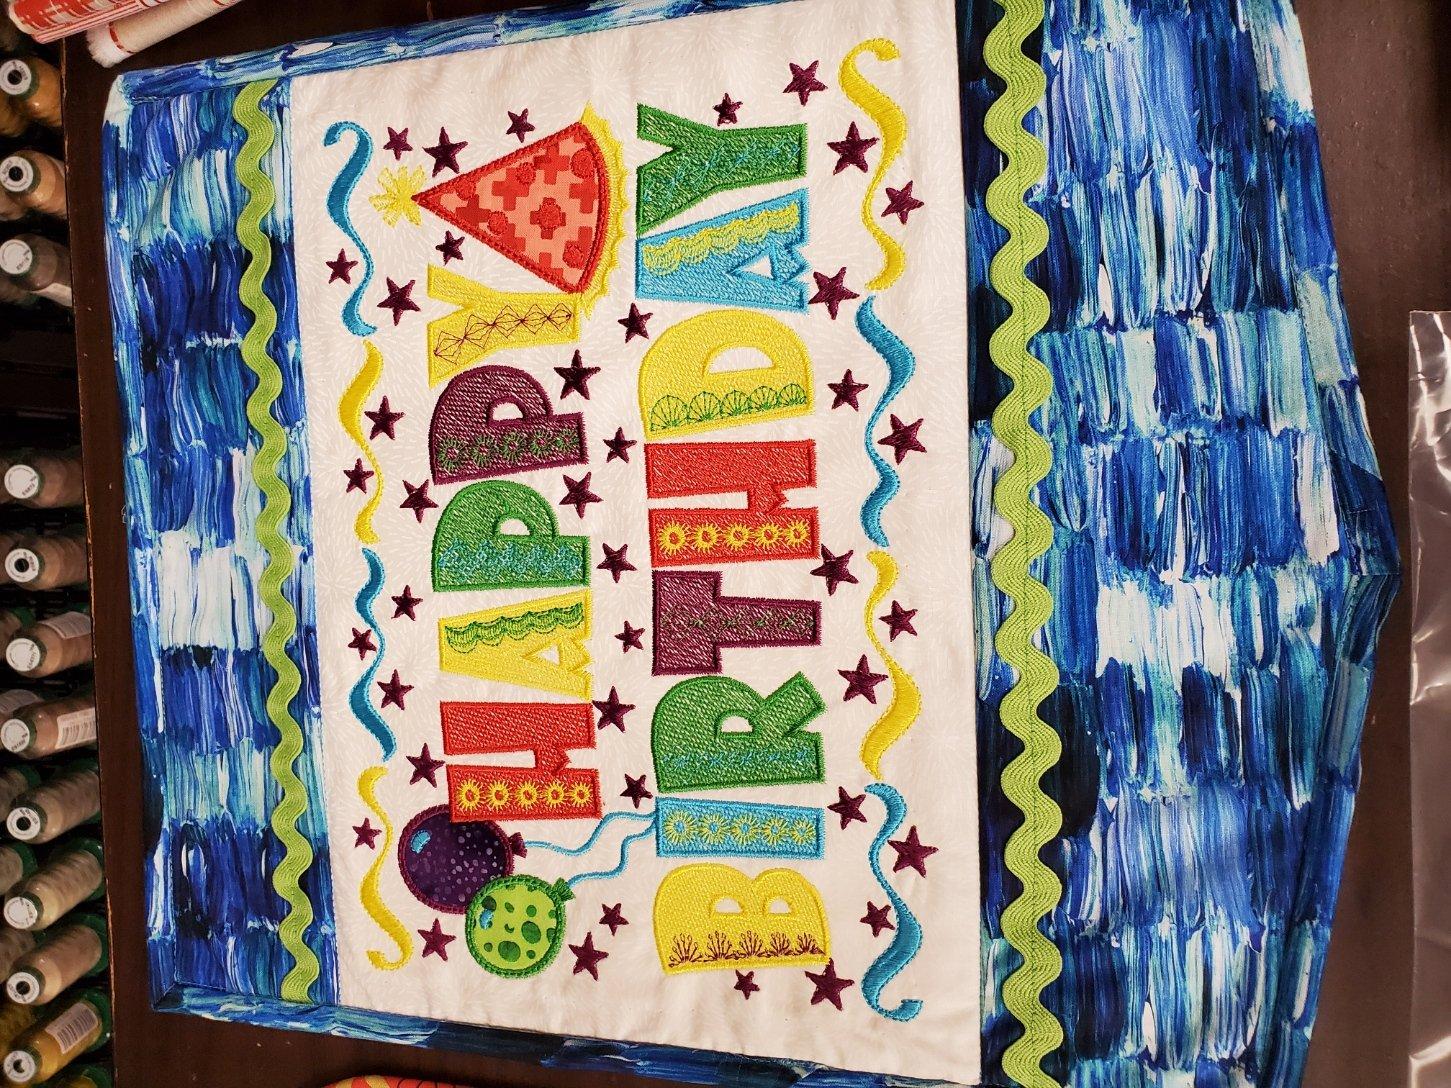 Happy Birthday Table Top Display Fabric Kit